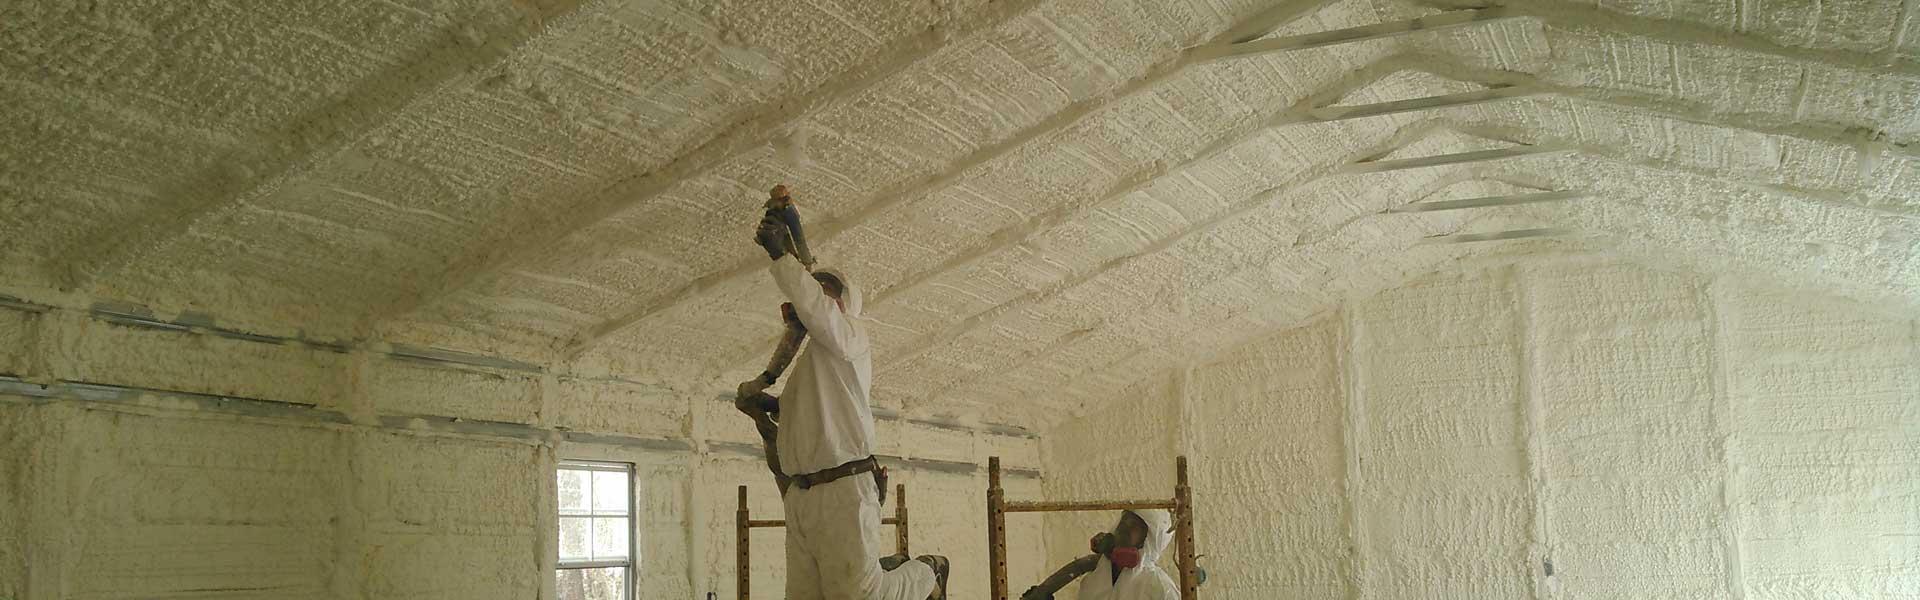 Spray Foam - Timco Insulation & Fireplaces